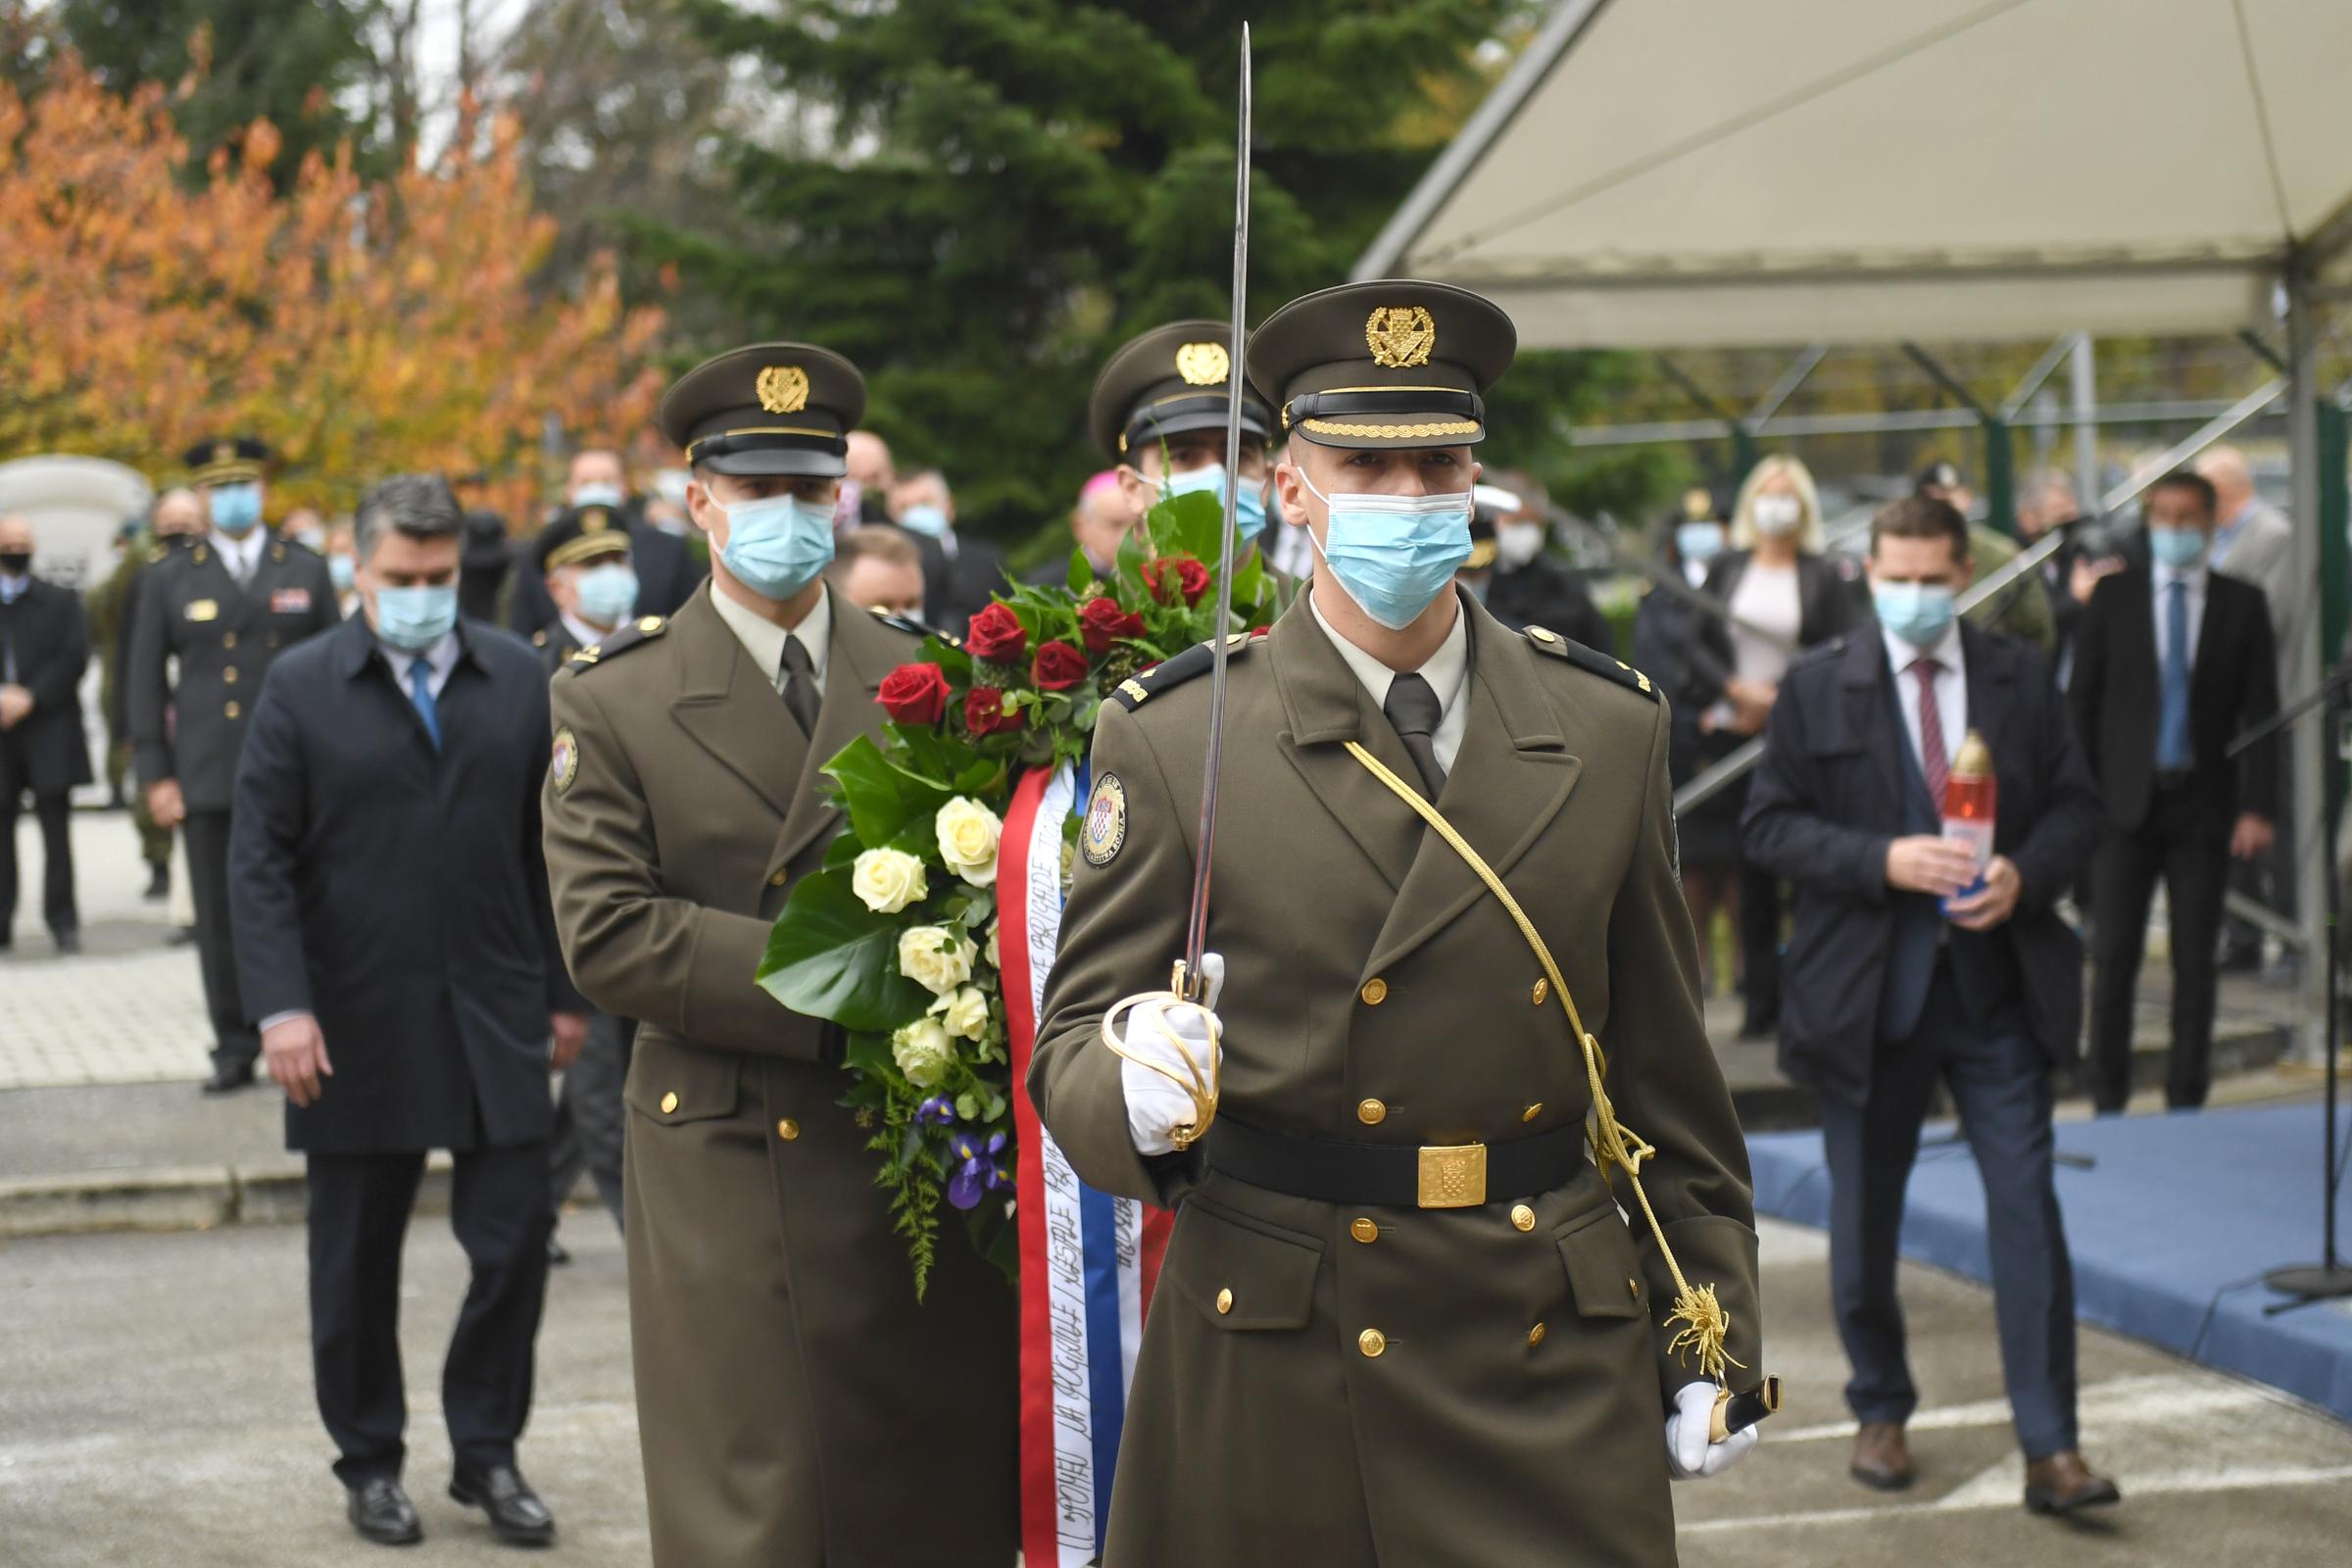 Ministar Banožić sudjelovao na obilježavanju 30. obljetnice Tigrova